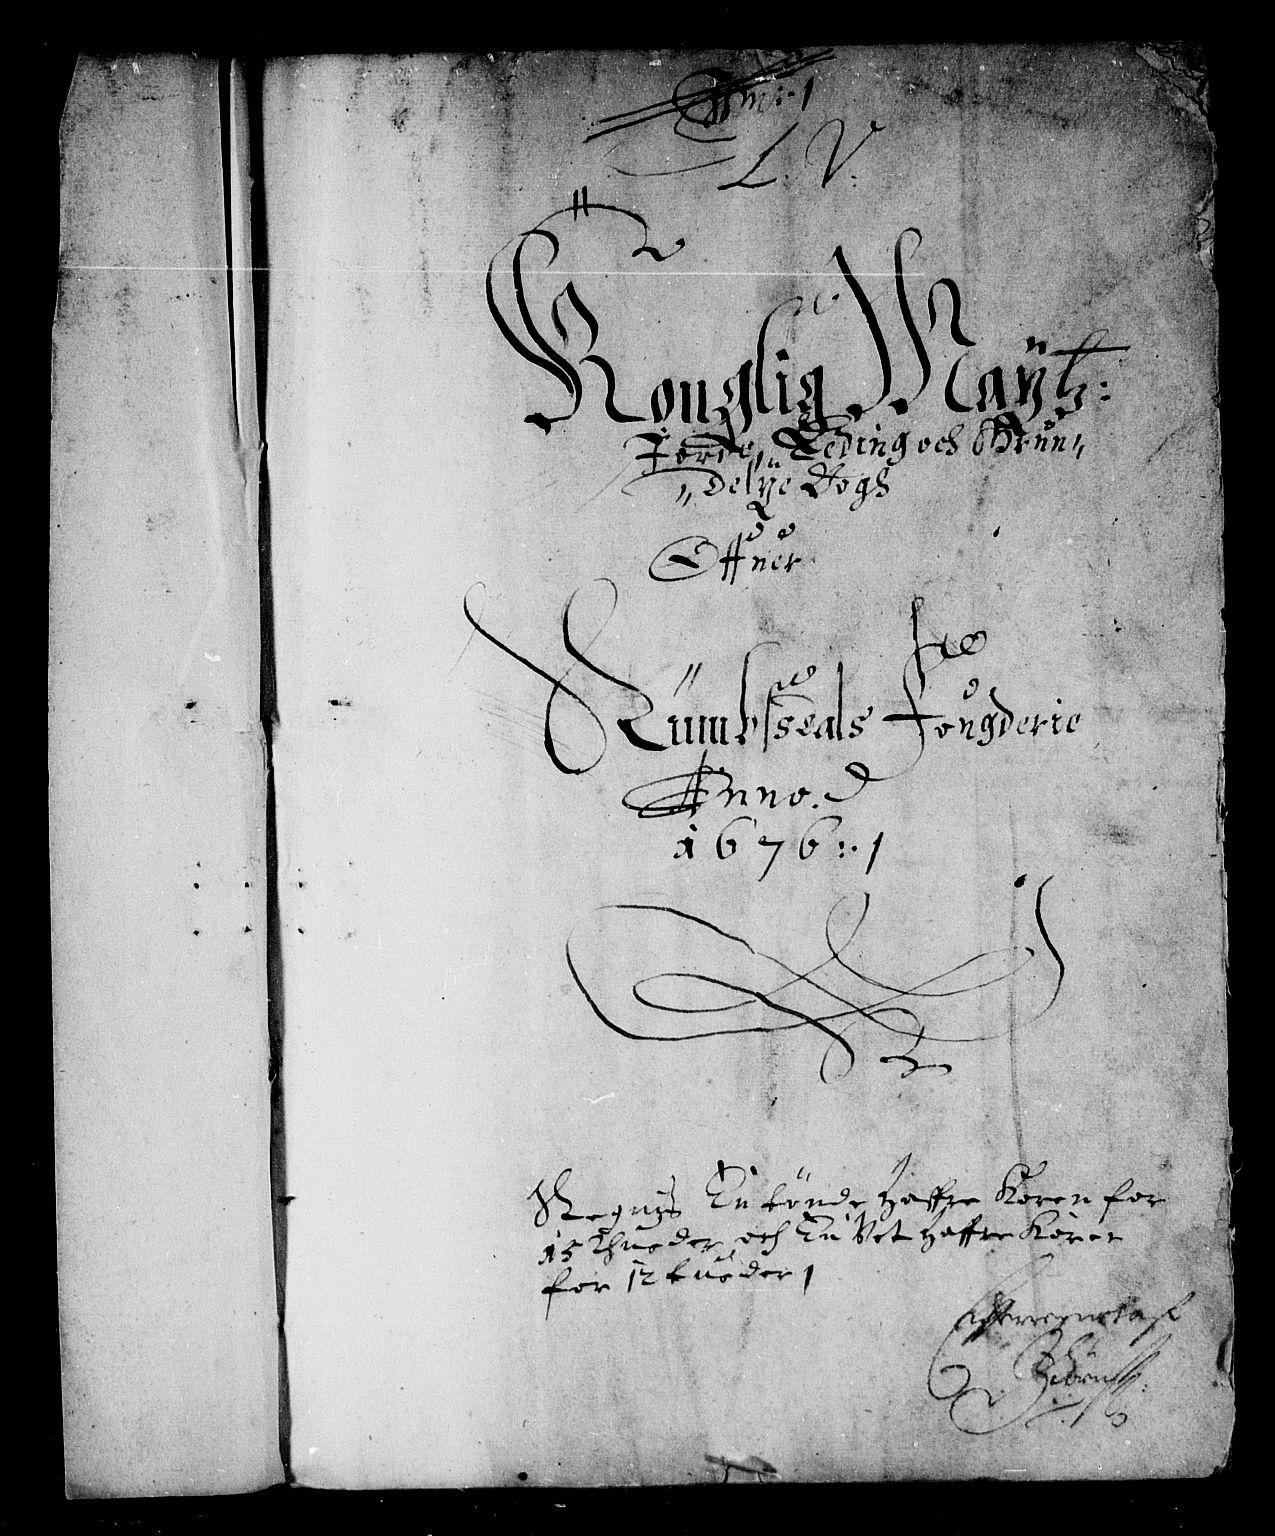 RA, Rentekammeret inntil 1814, Reviderte regnskaper, Stiftamtstueregnskaper, Trondheim stiftamt og Nordland amt, R/Rd/L0044: Trondheim stiftamt, 1671-1676